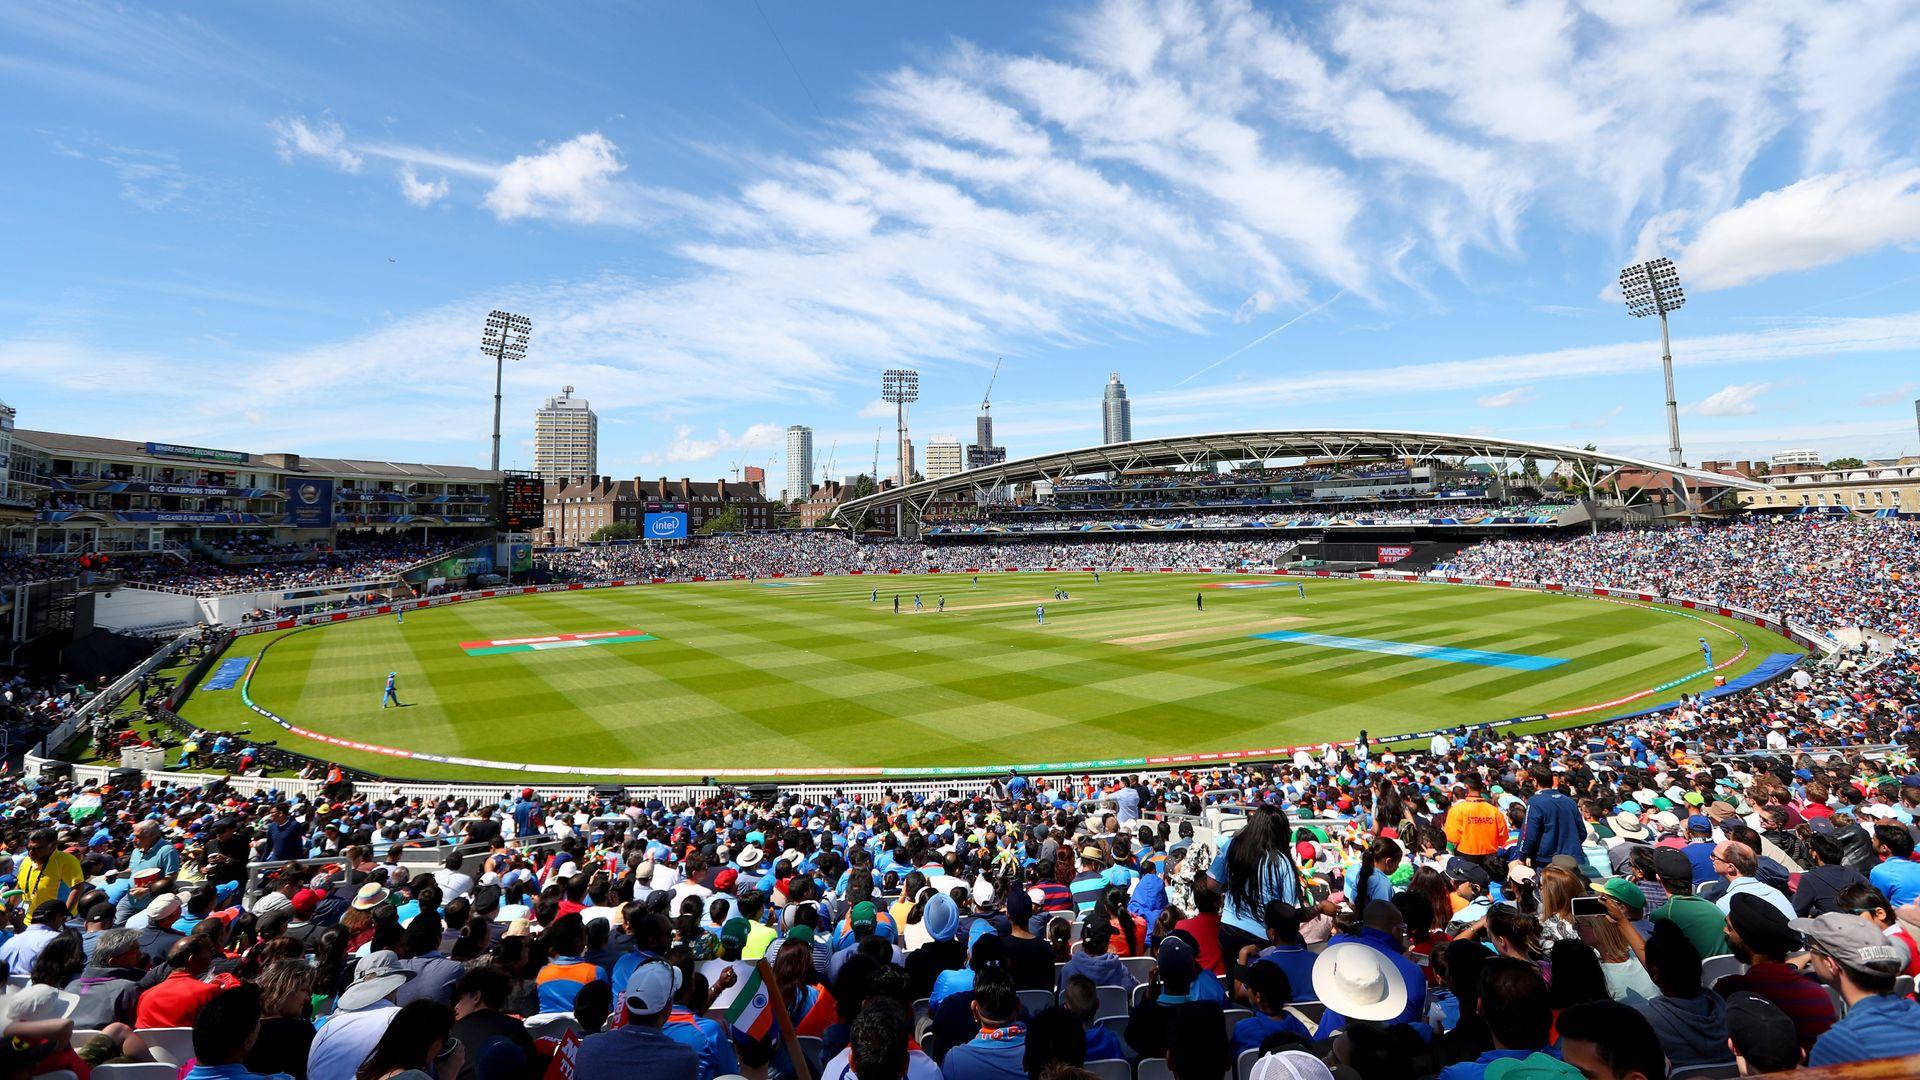 Surrey keen to stage international cricket in 2020